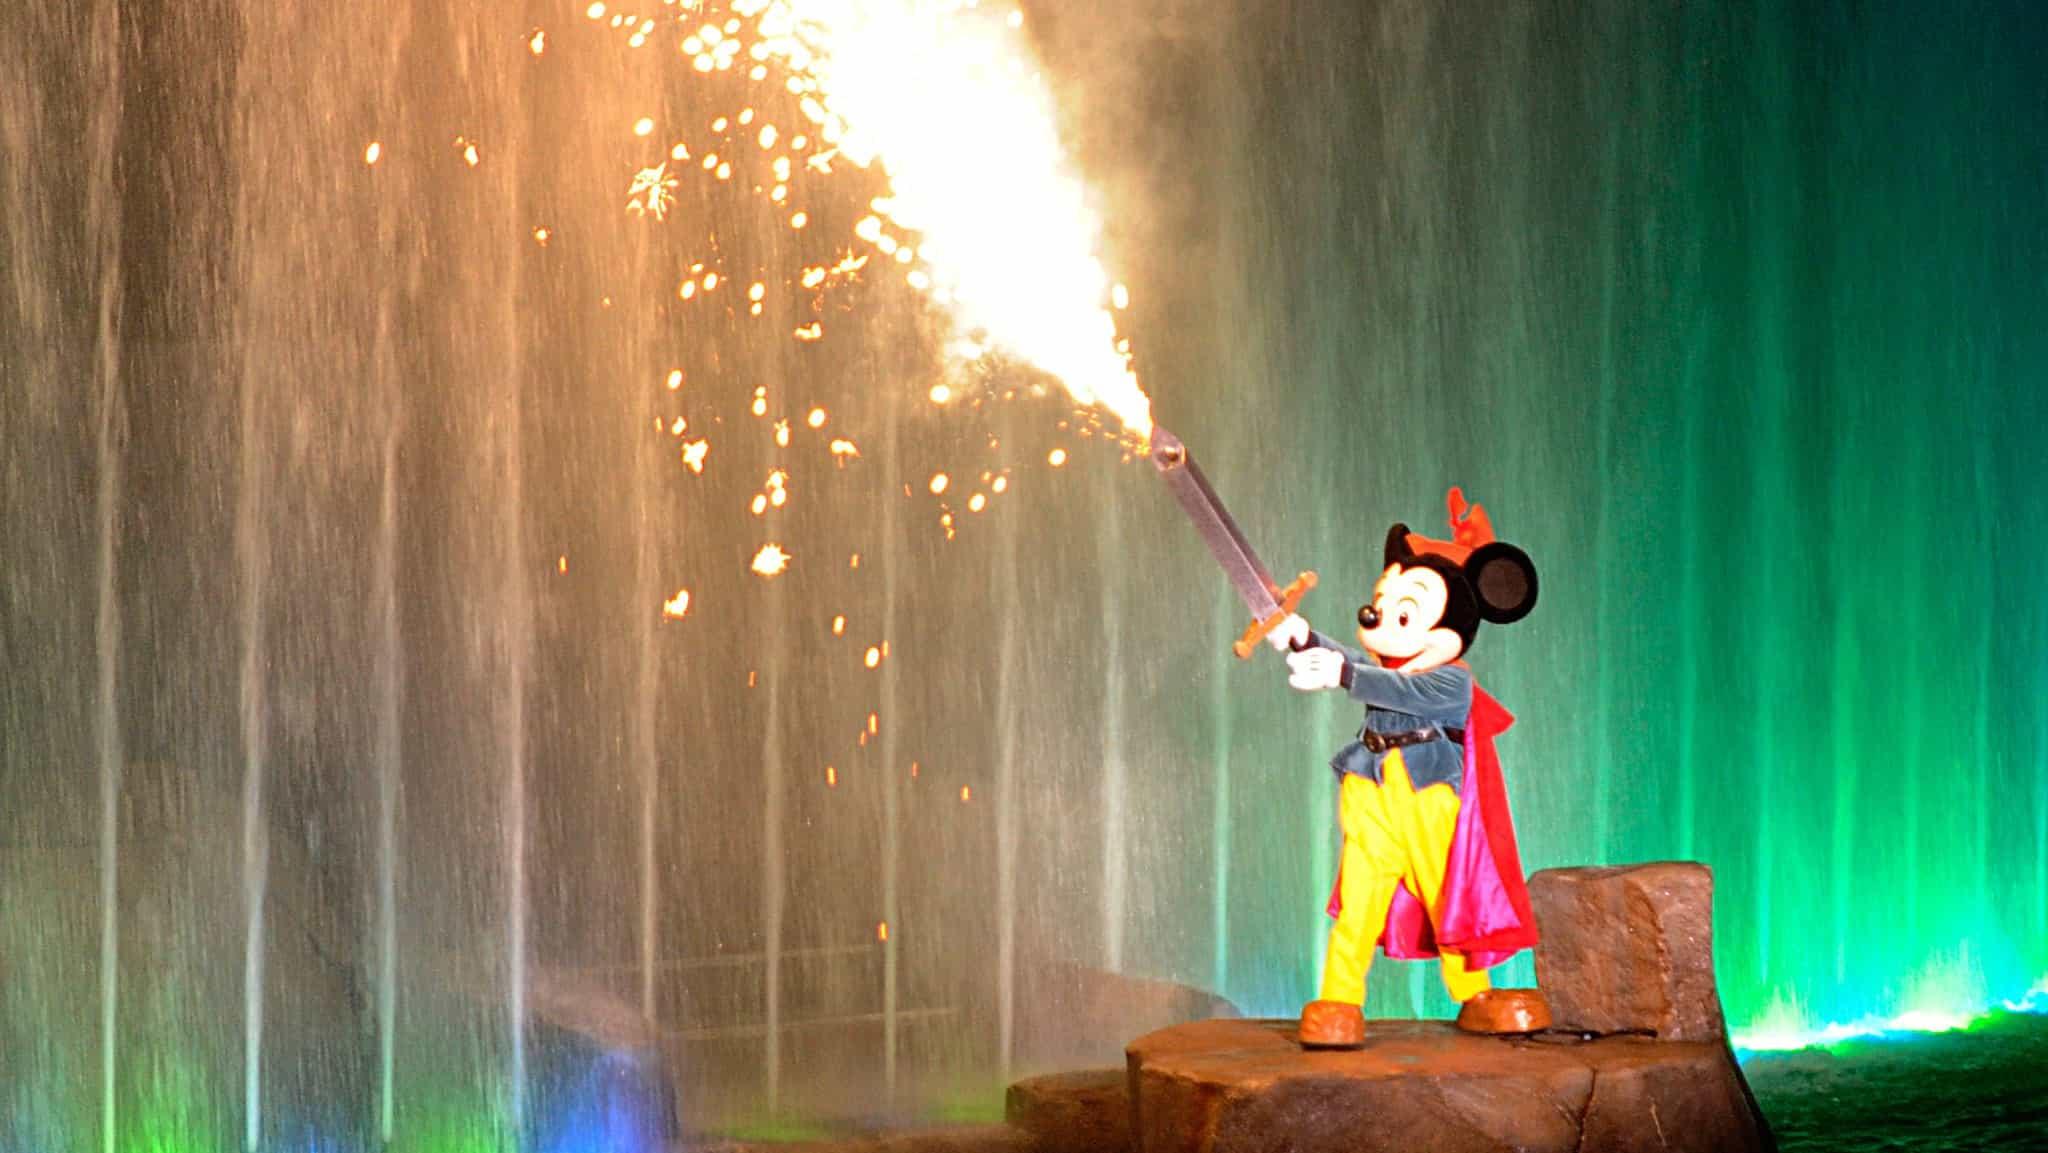 fantasmic 02 new - Where to meet Mickey Mouse at Disney World